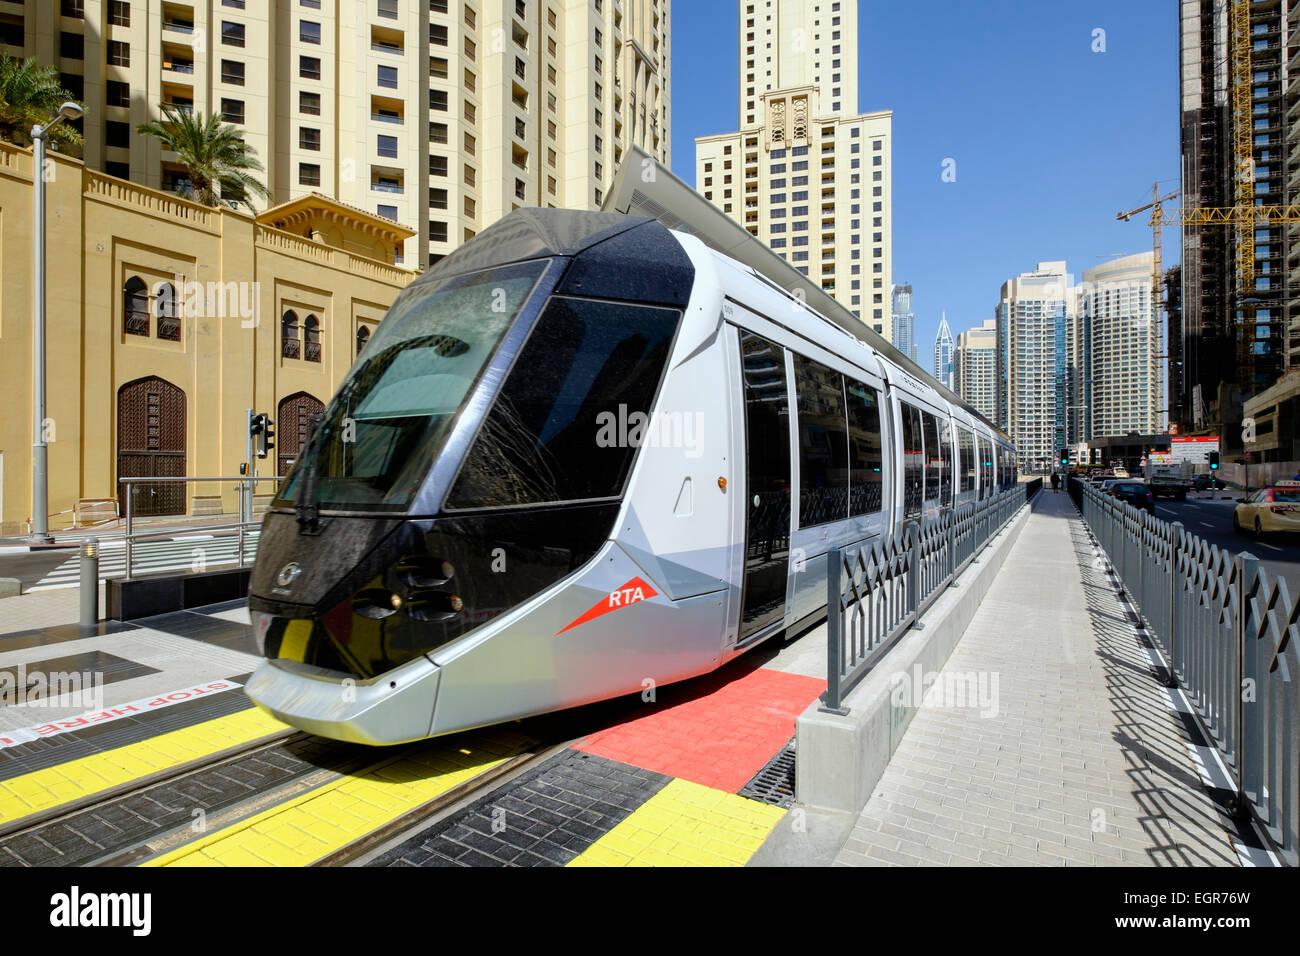 New Dubai tram in Marina district of New Dubai in United Arab Emirates - Stock Image